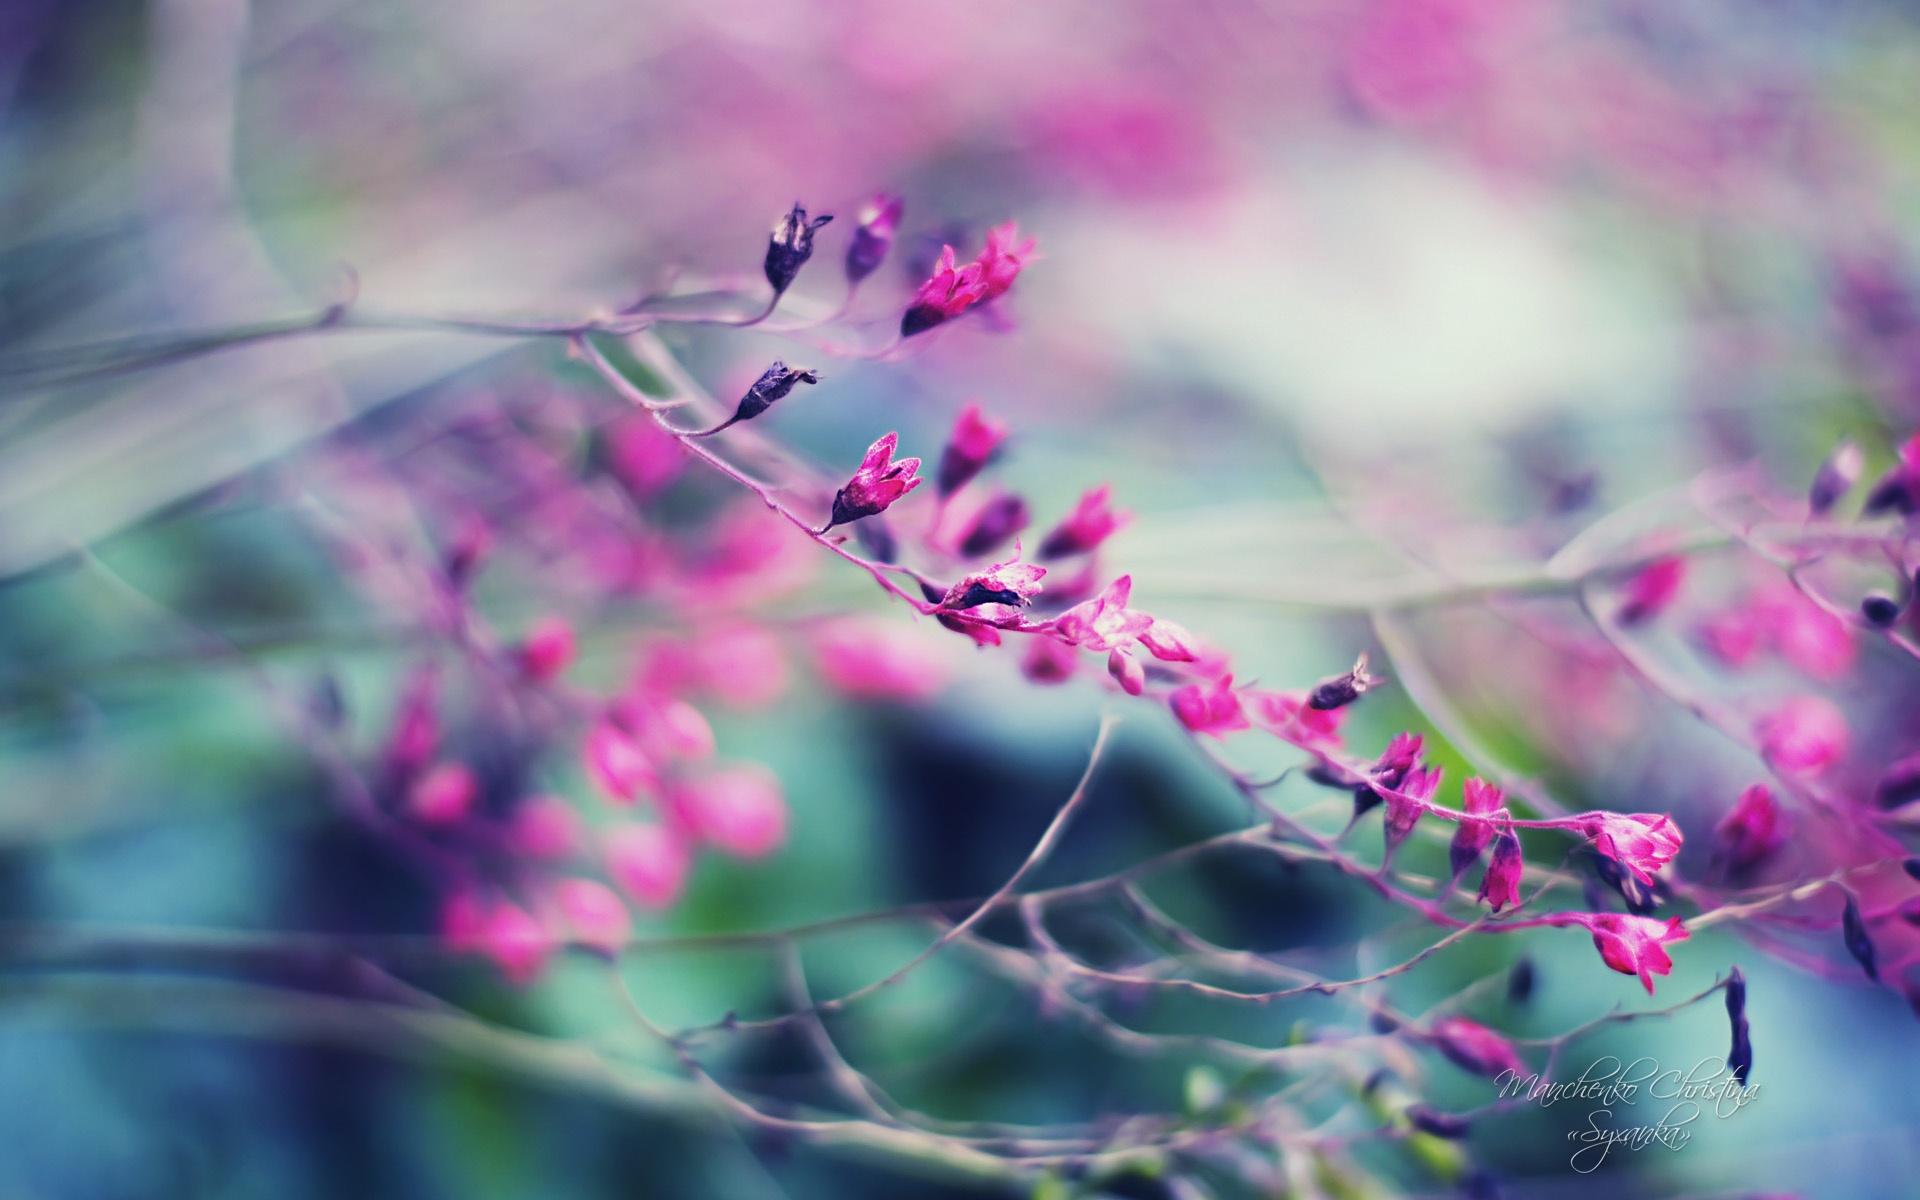 Fondos De Pantalla Hermosos Jardines, Flores Moradas - Photography Nature Depth Of Field - HD Wallpaper